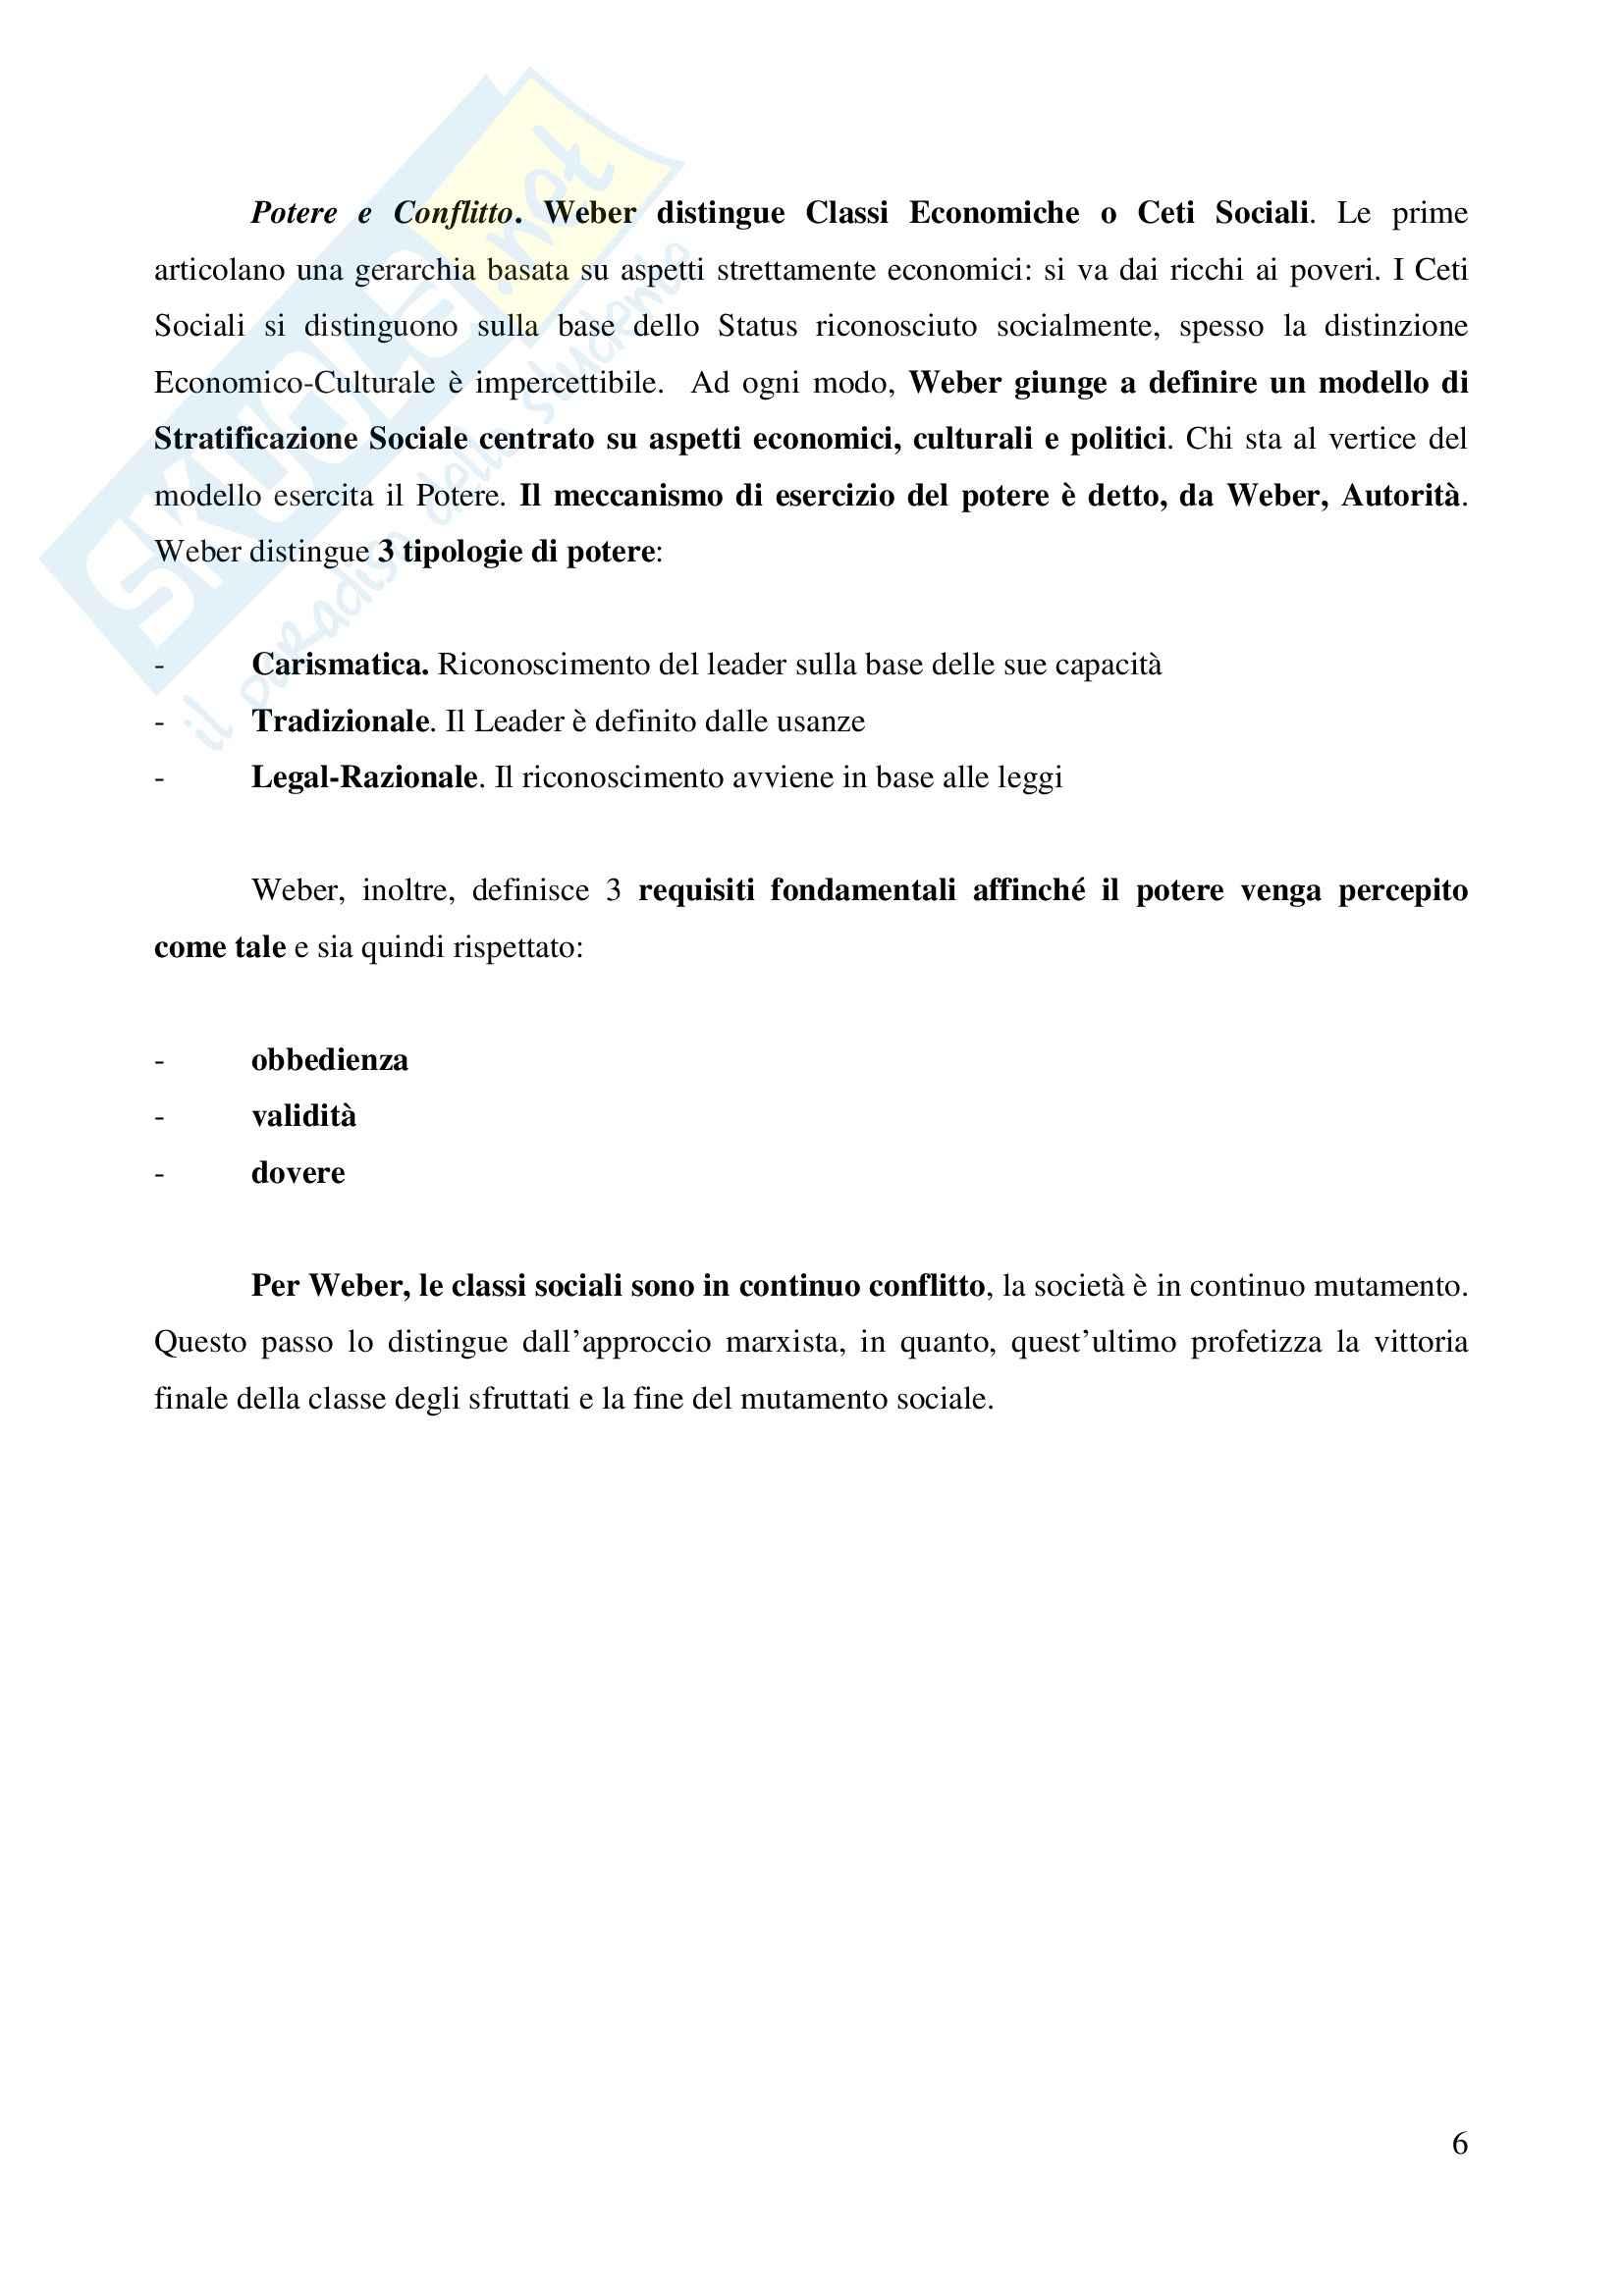 Sociologia - Appunti Pag. 6